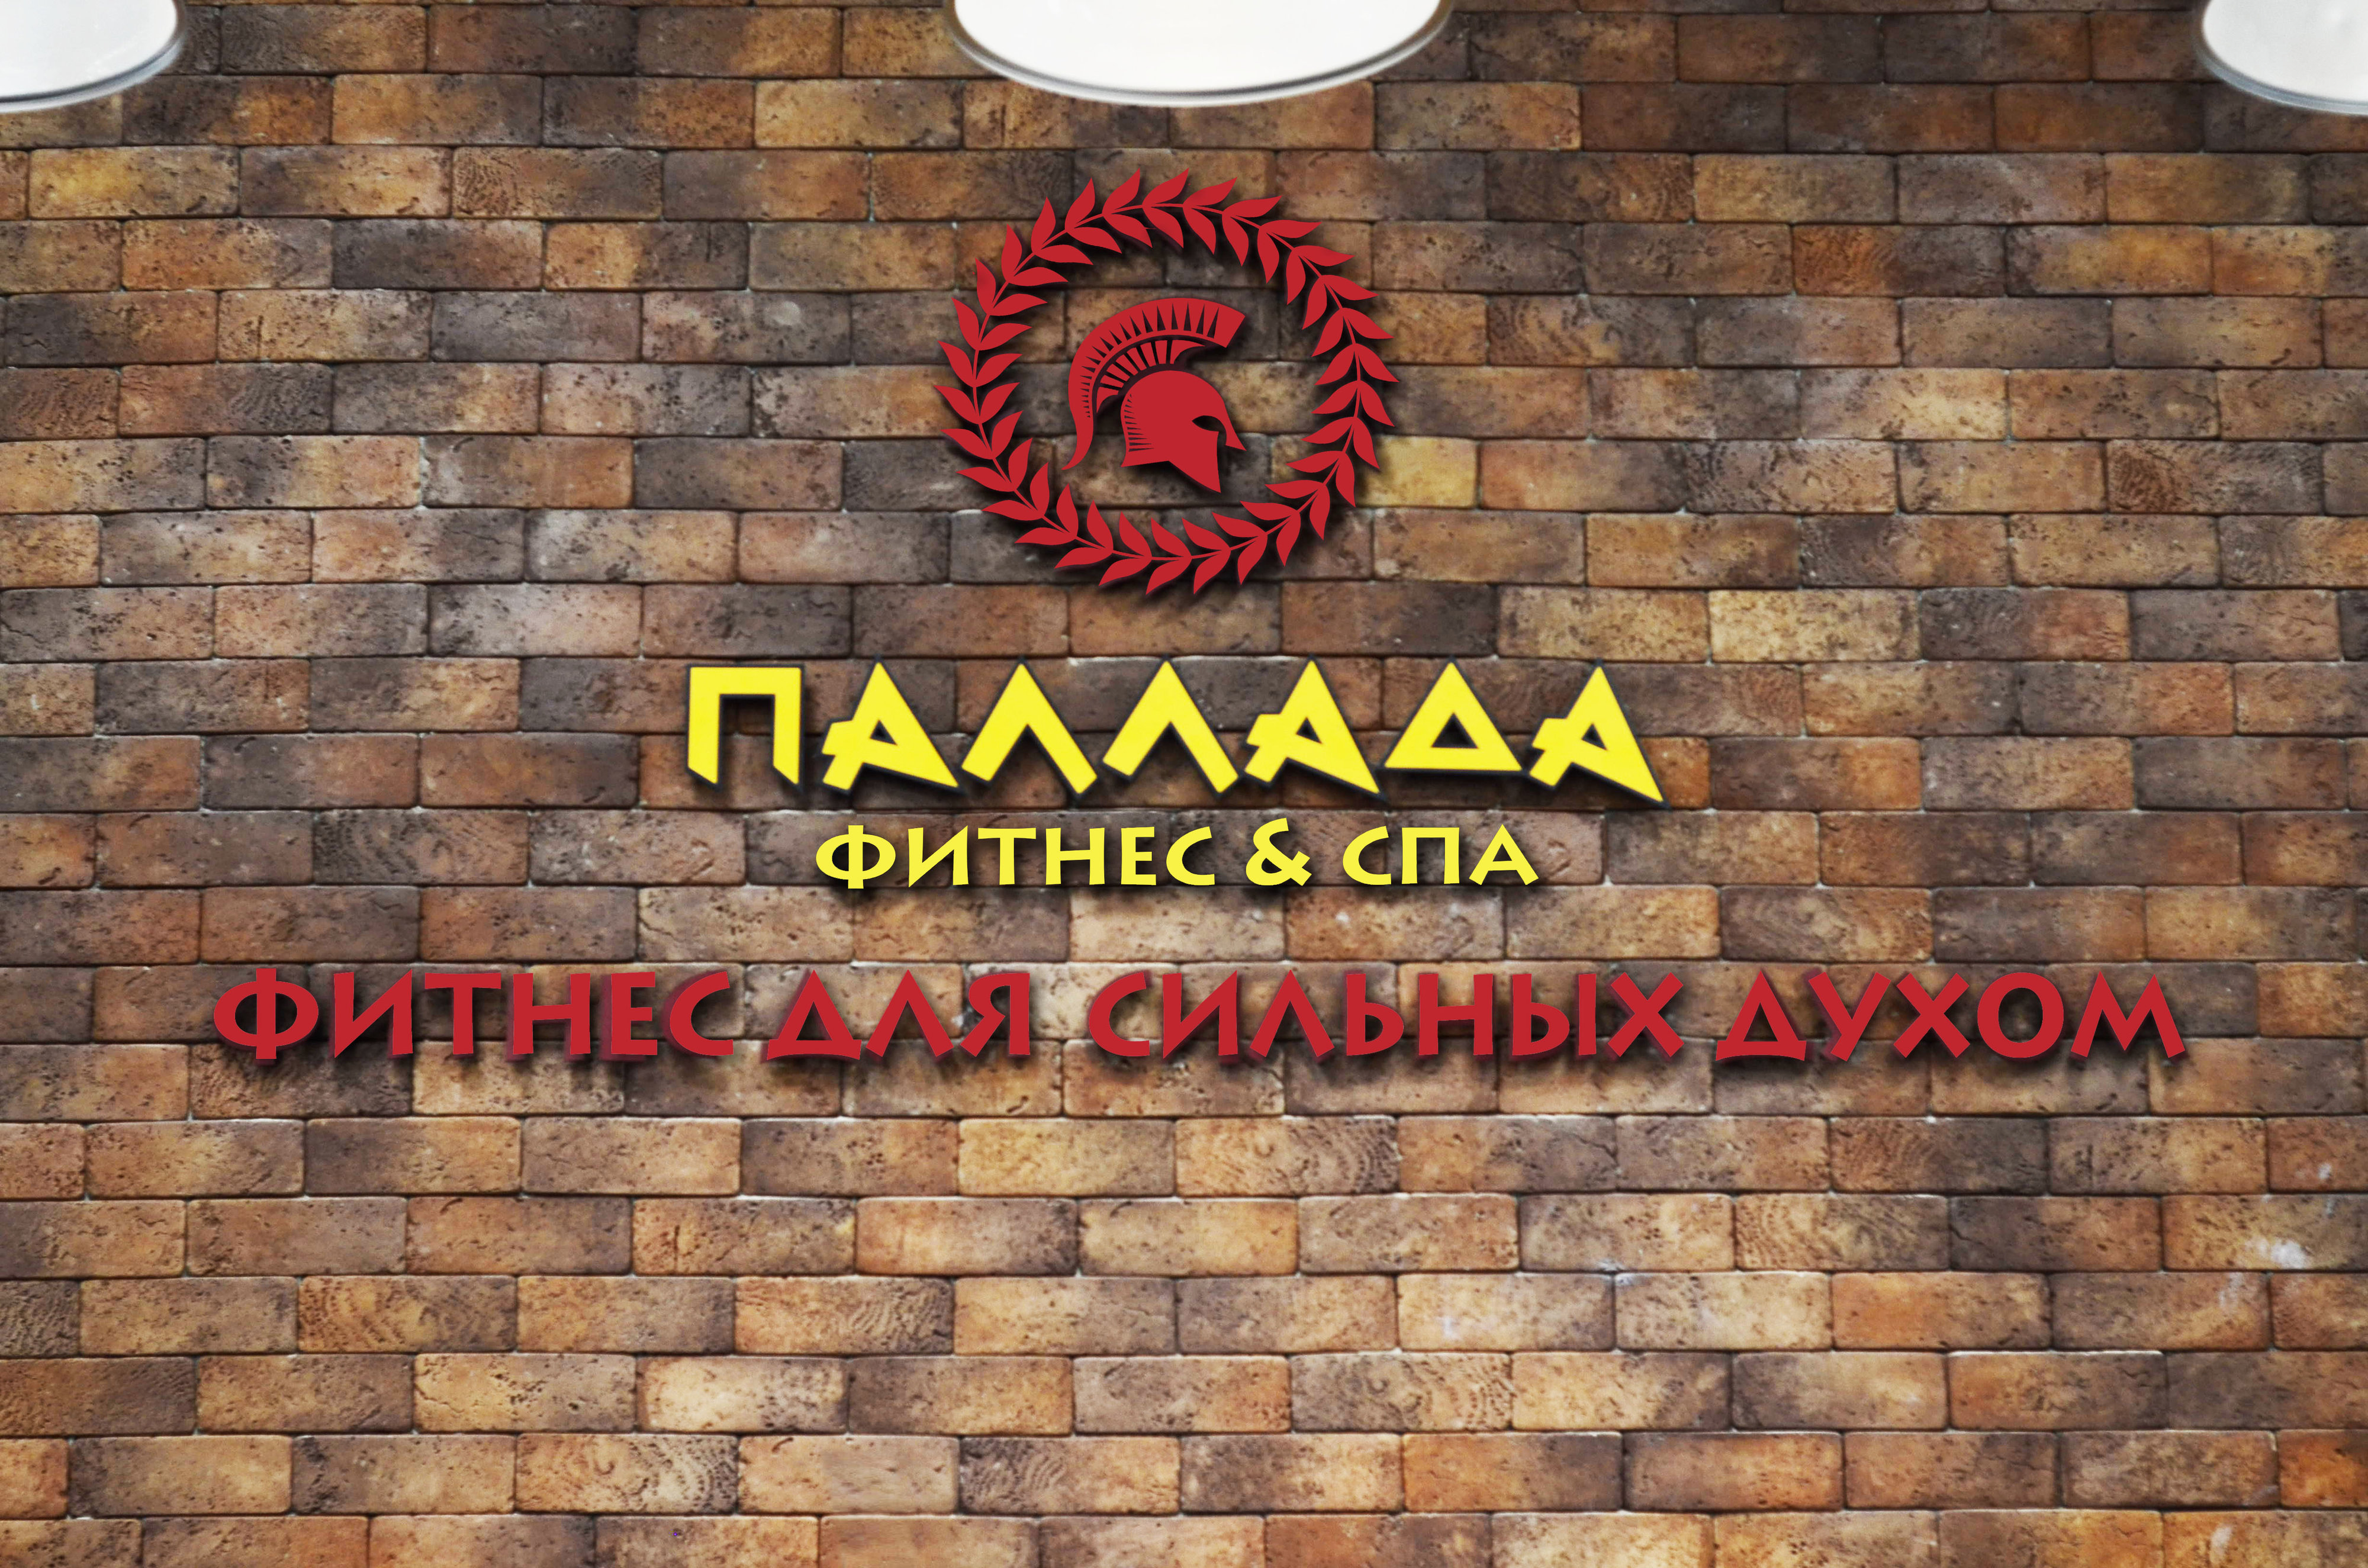 фитнес клуб в москве метро новогиреево